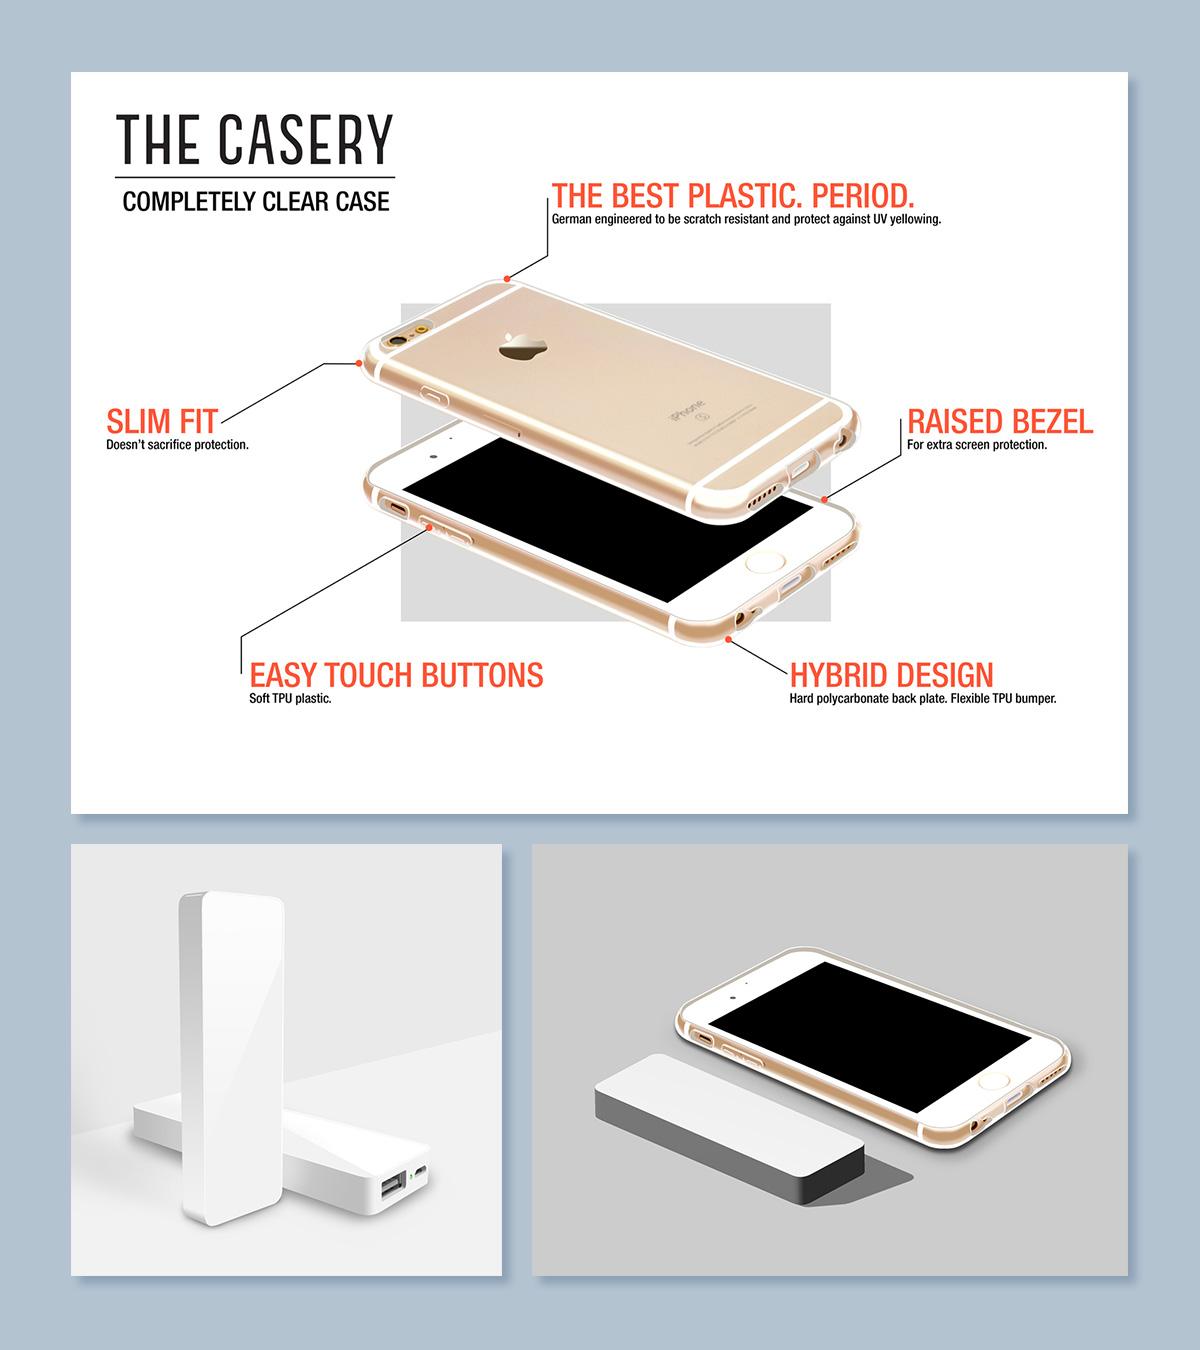 casery-casepowerbank-mockups.jpg